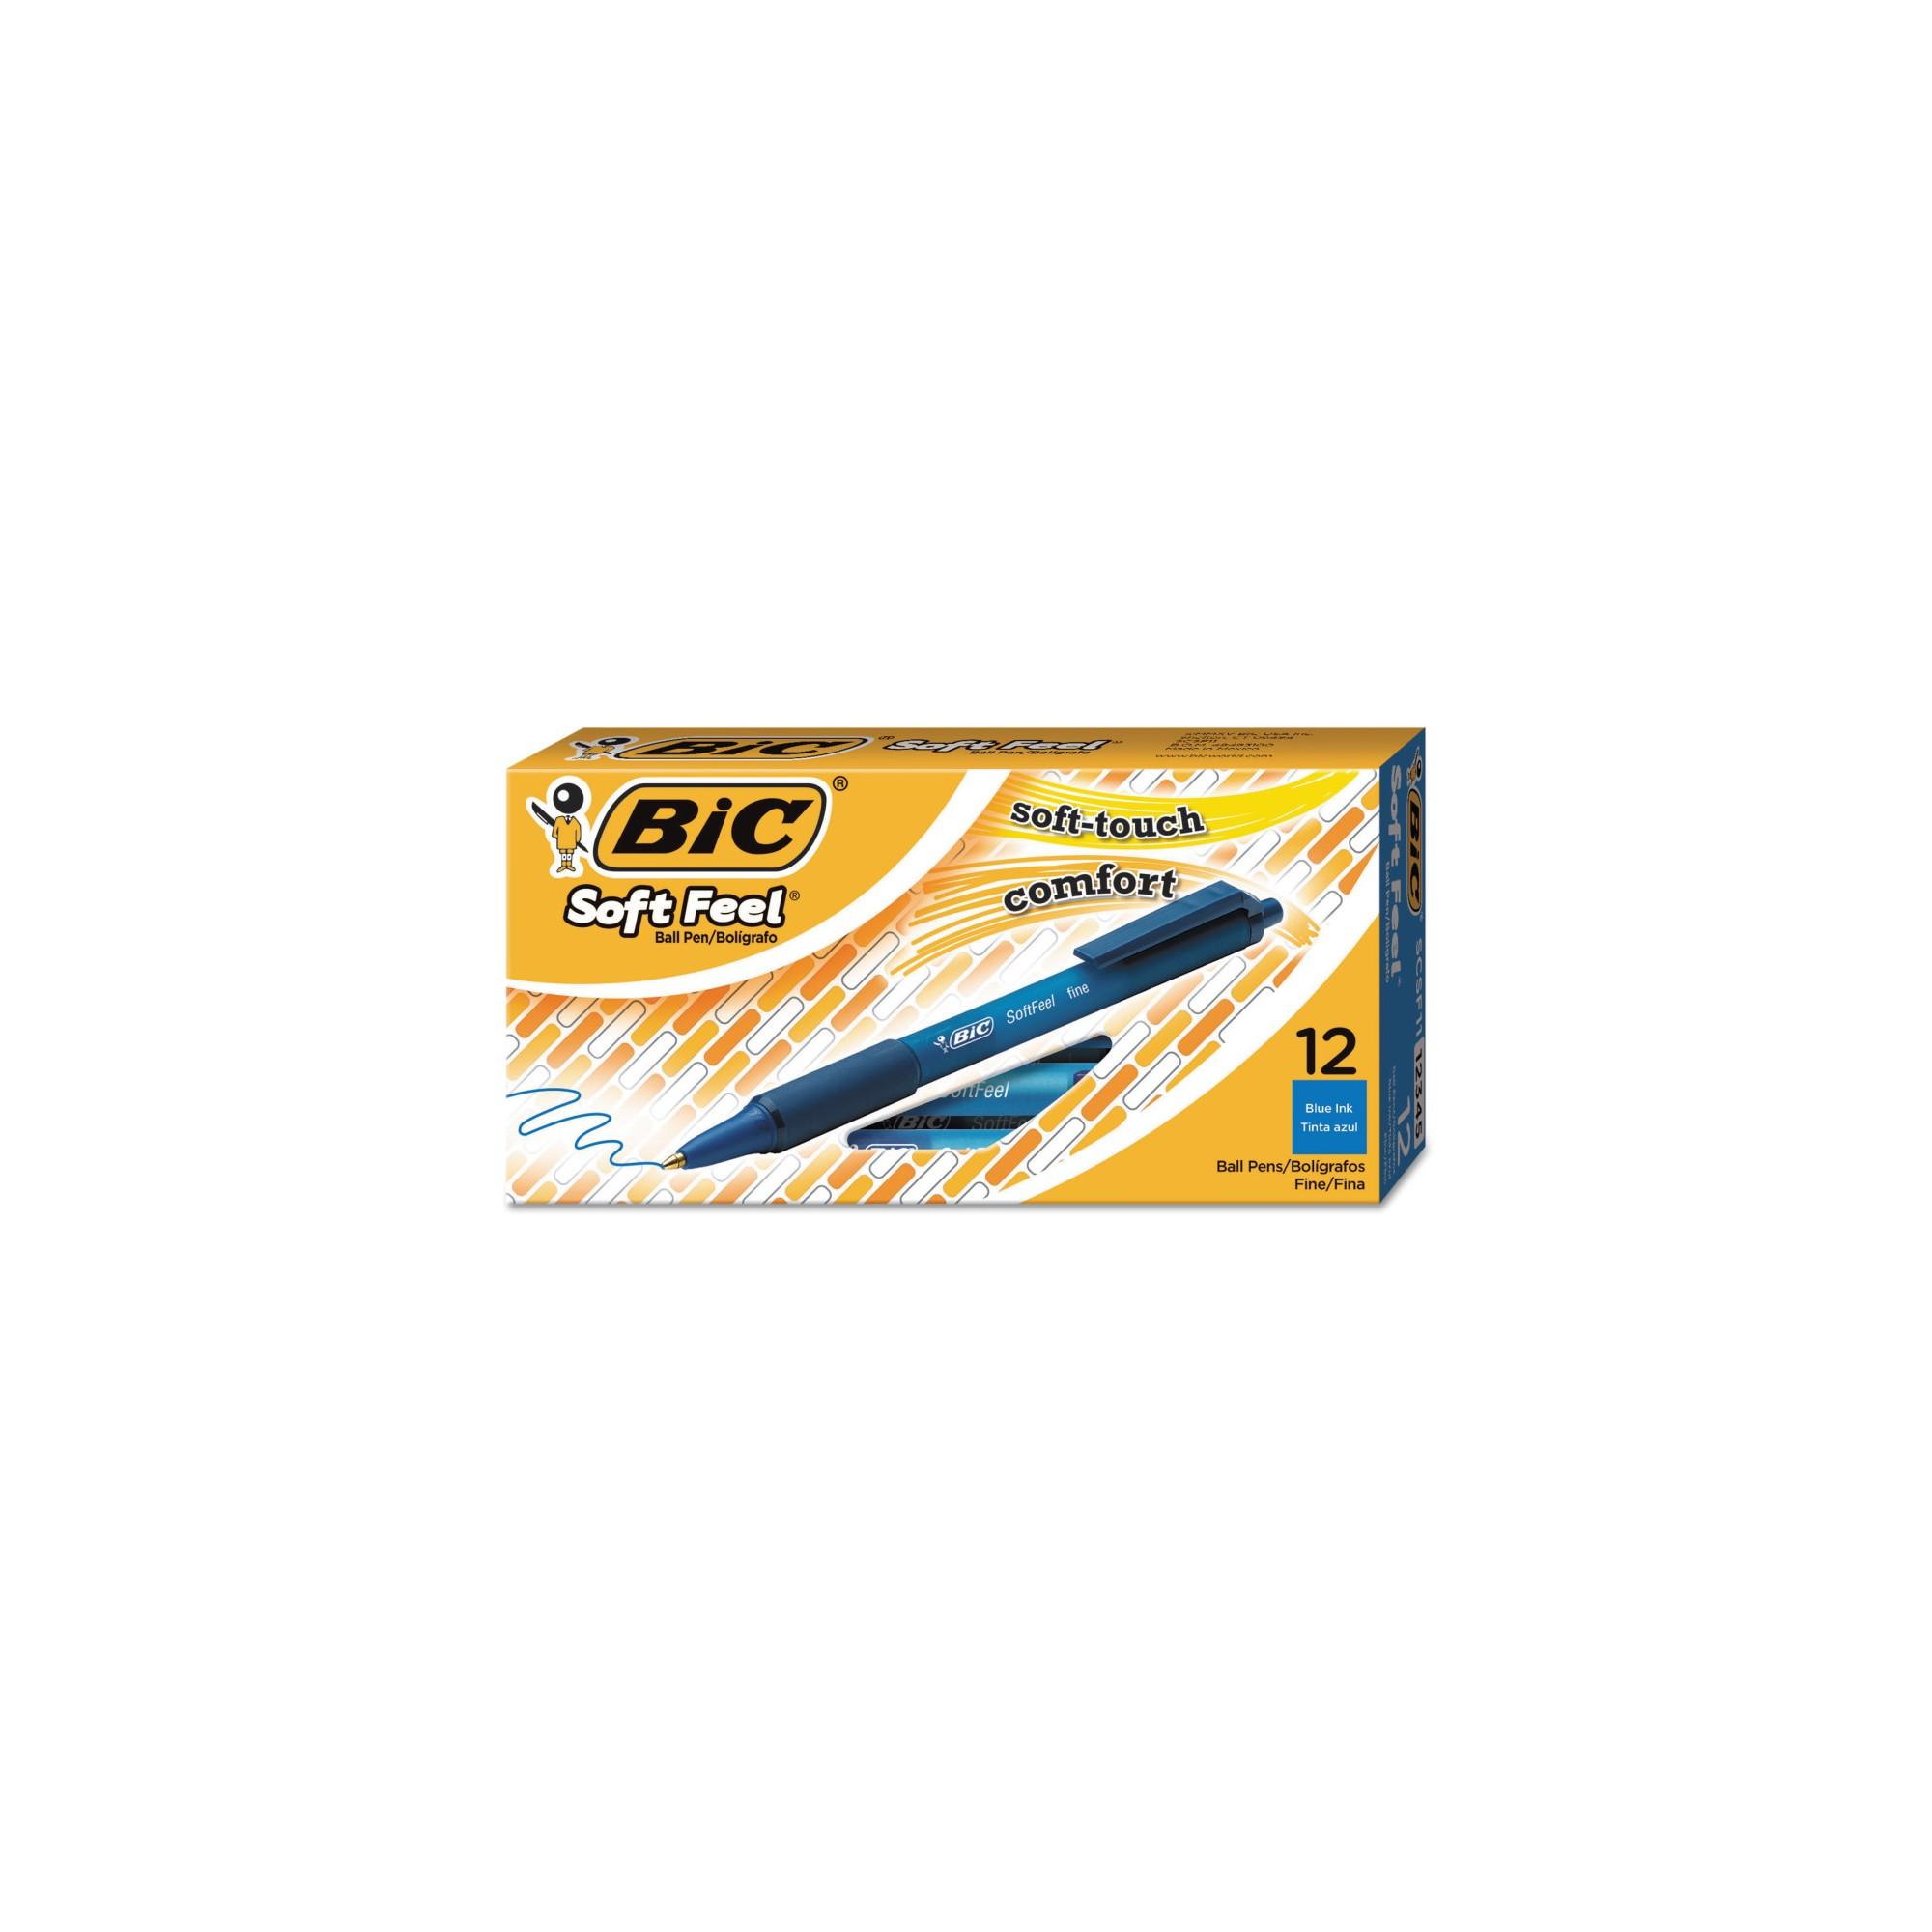 Bic Soft Feel Ballpoint Fine Sized Retractable Pen - Blue - 12ct - 2 Pack, Blu